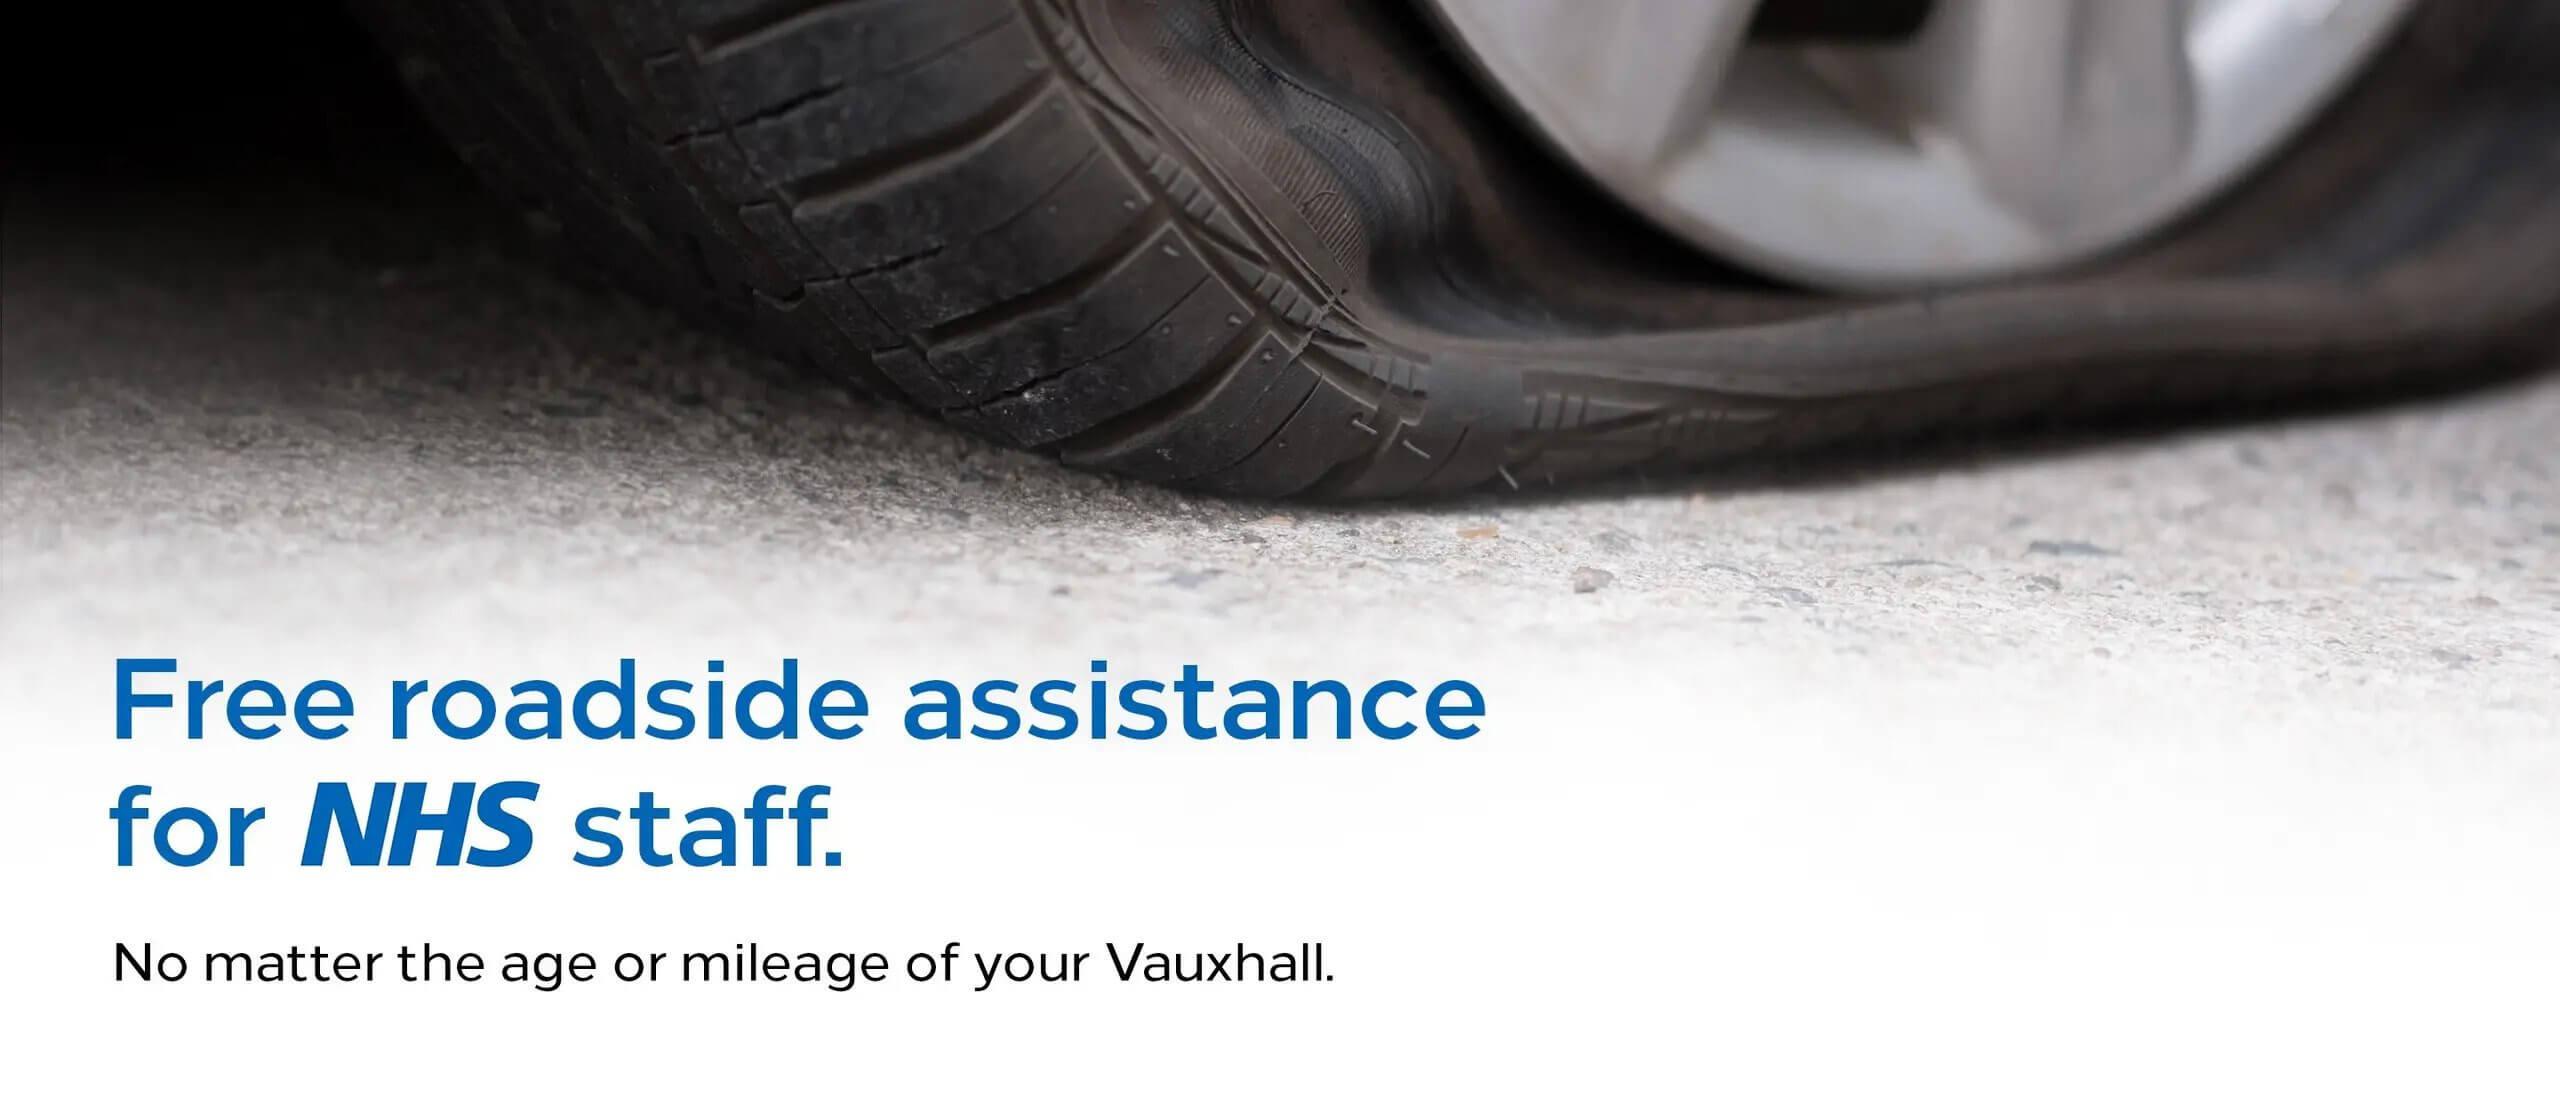 Free roadside assistance for NHS staff